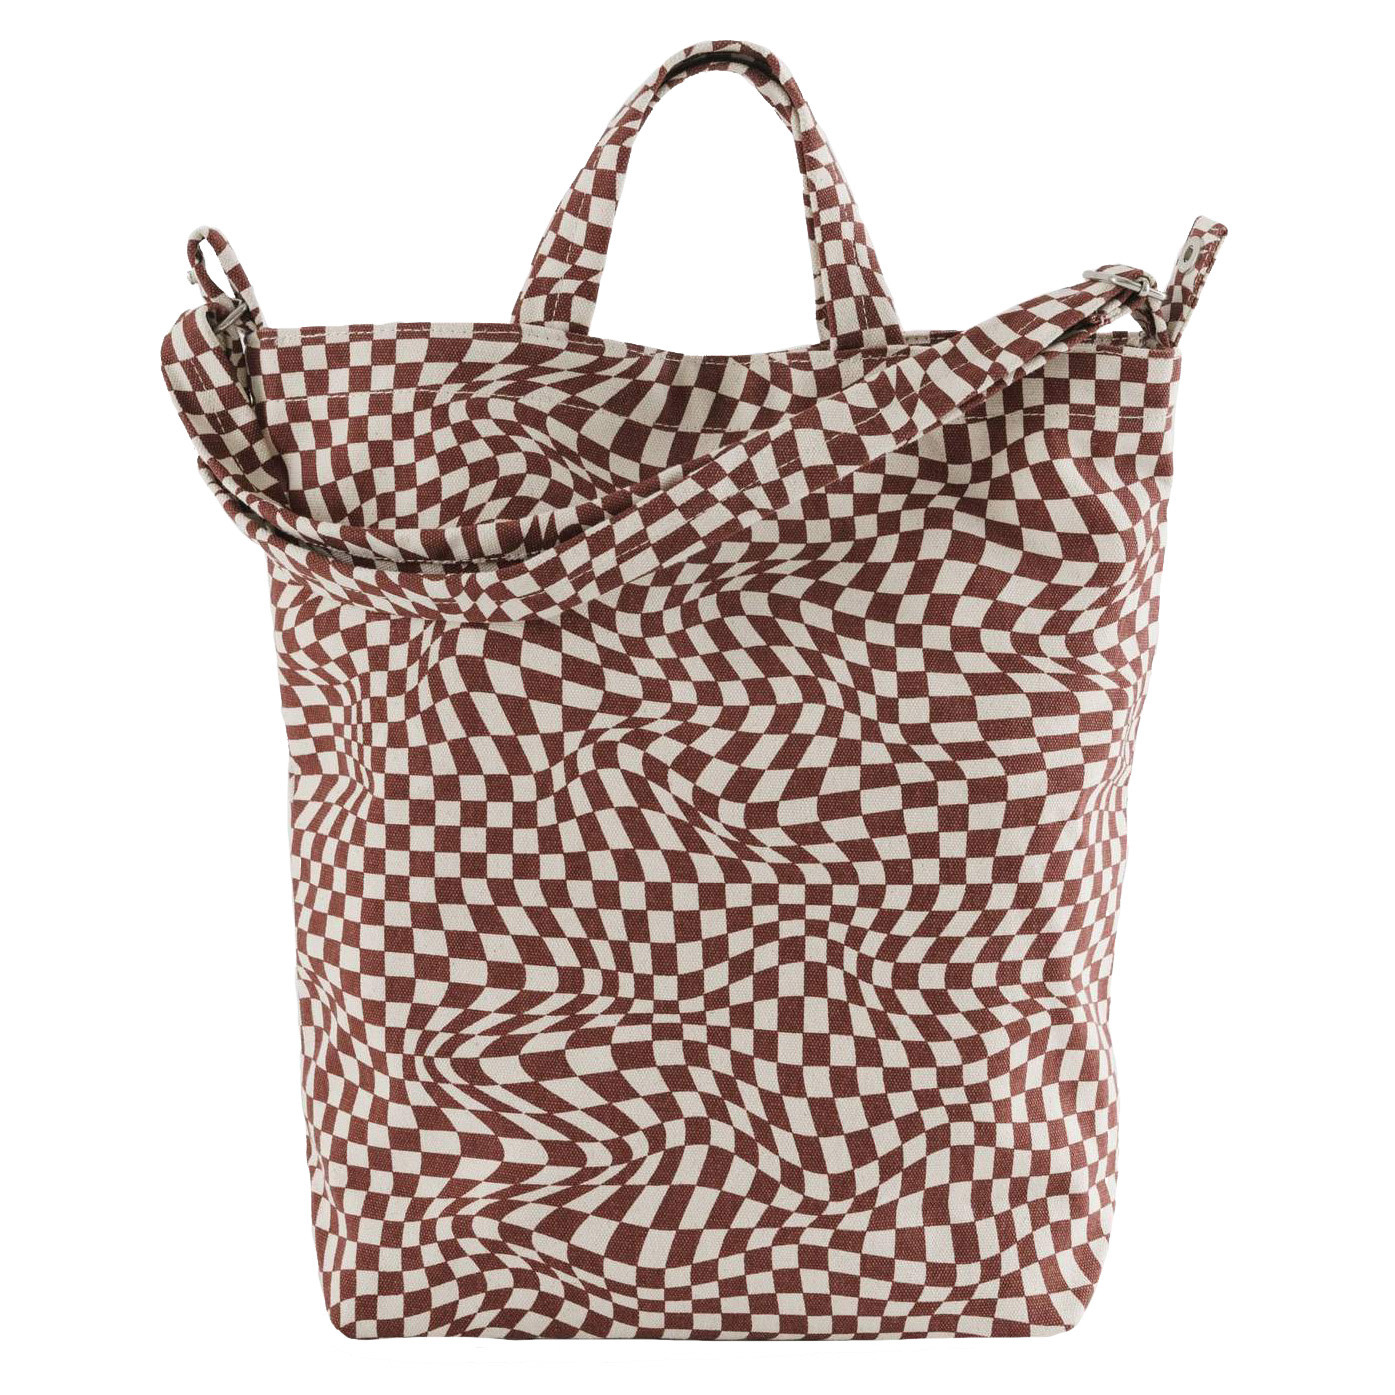 Baggu Baggu Duck Bag - Maroon Trippy Checker